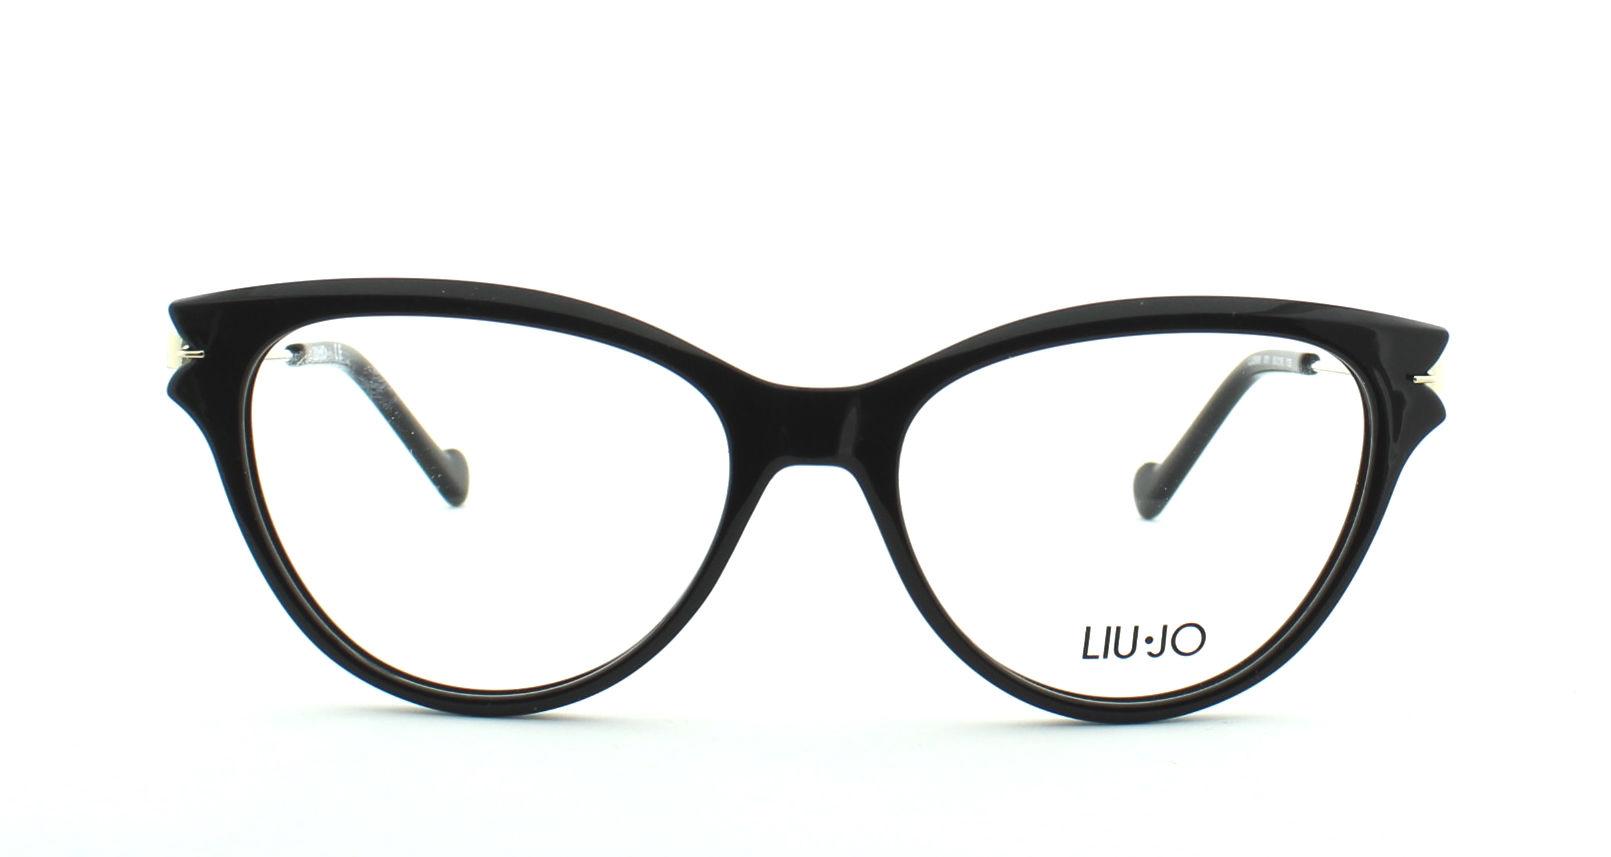 LIU-JO model 2688 col.001